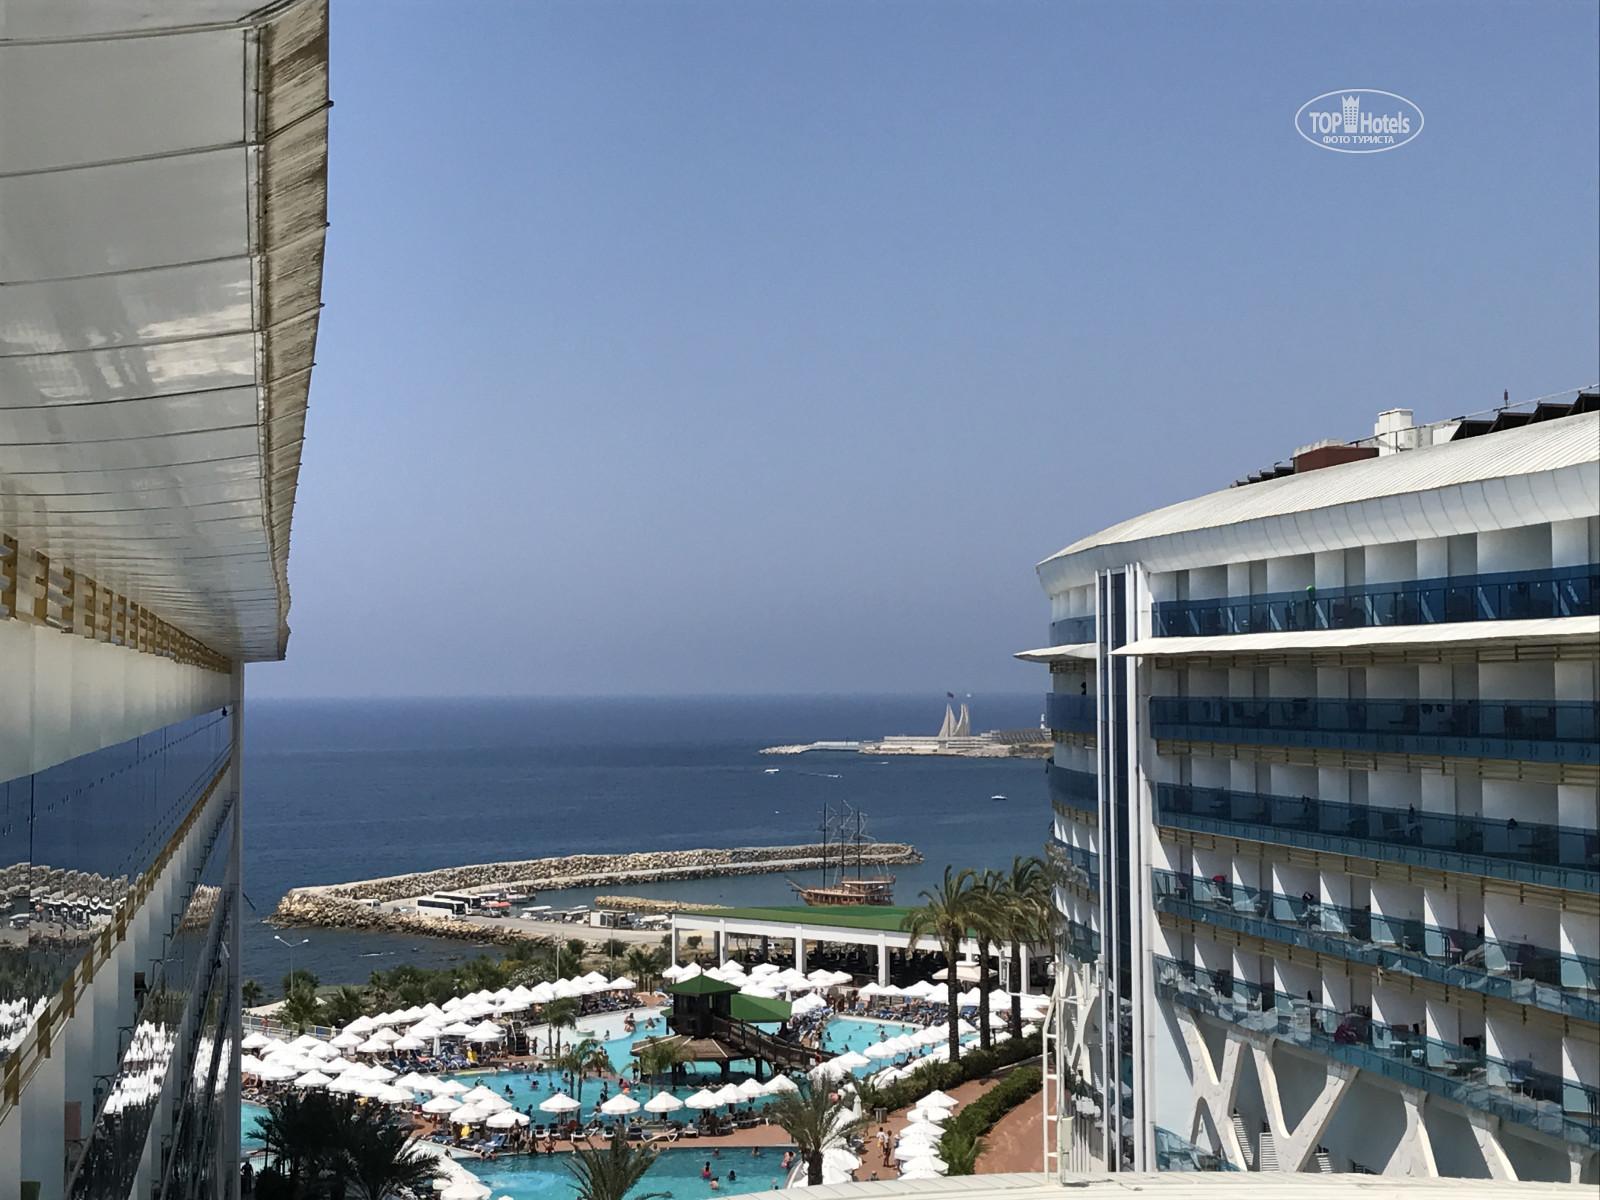 All photos отеля Vikingen Infinity Resort & Spa 5*. Rating of world ...